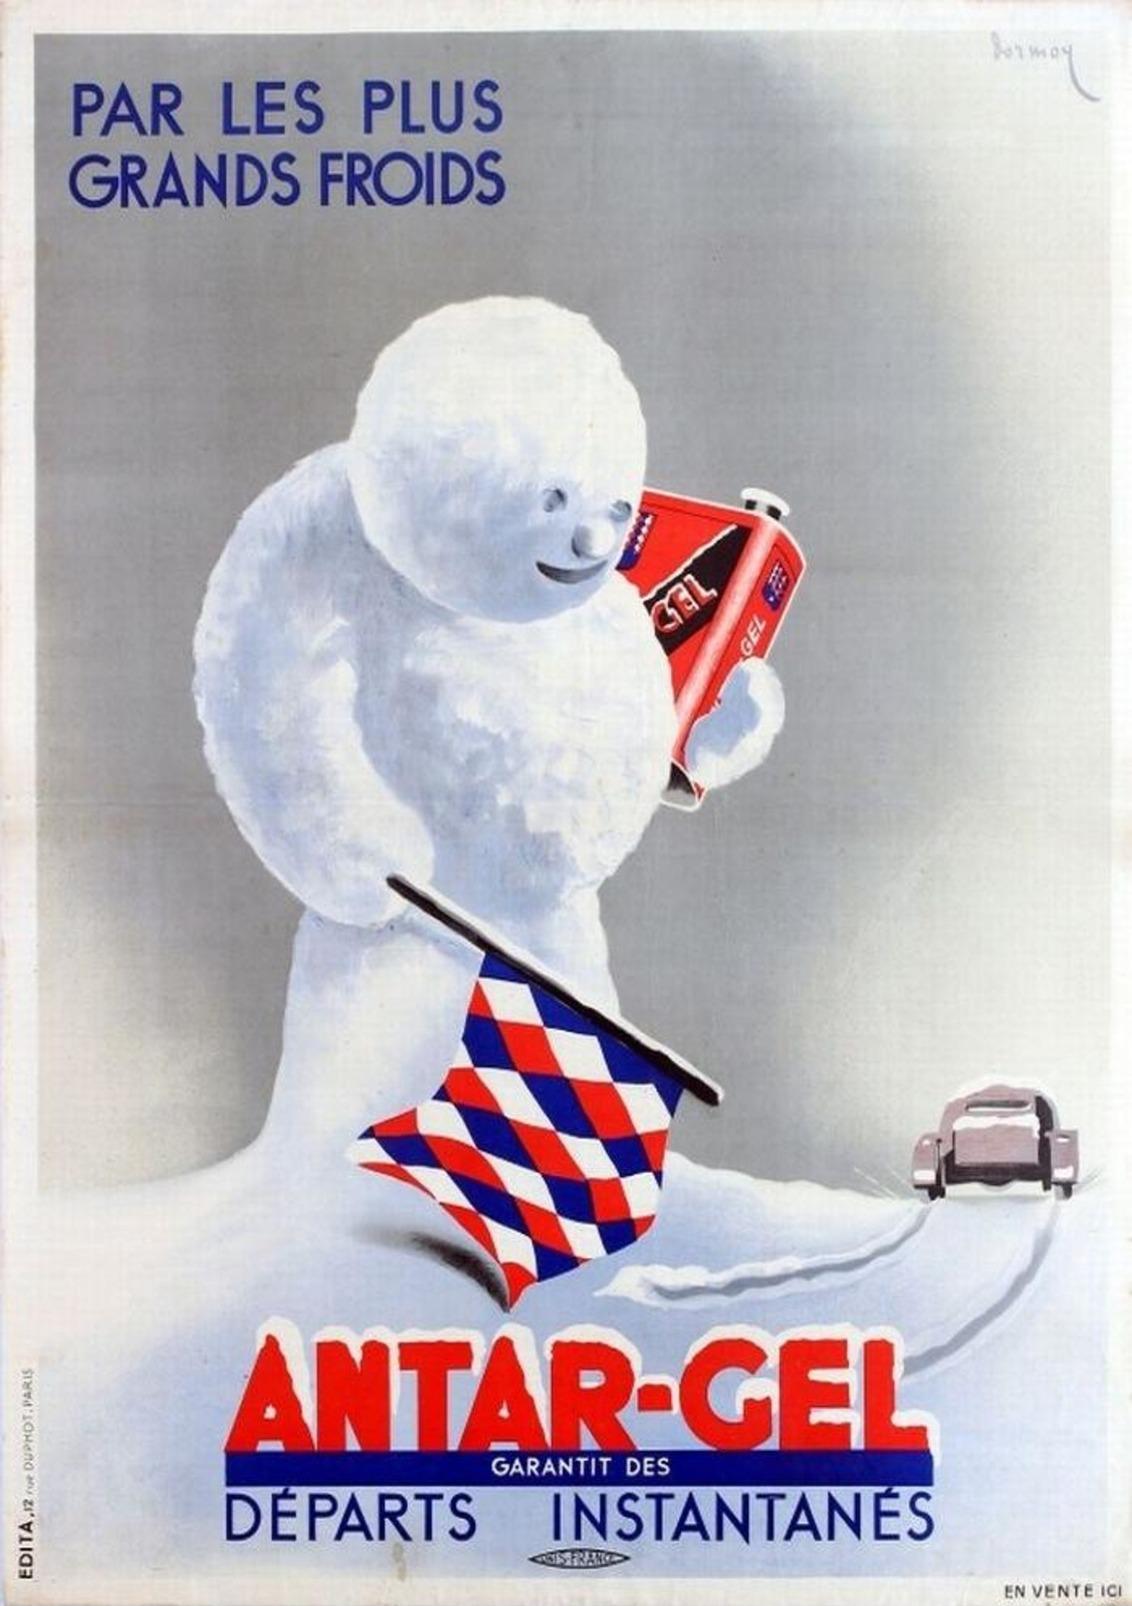 Antar-Gel Winter Motor Oil 1930s - Postcard - Poster Reproduction (N) - Publicité